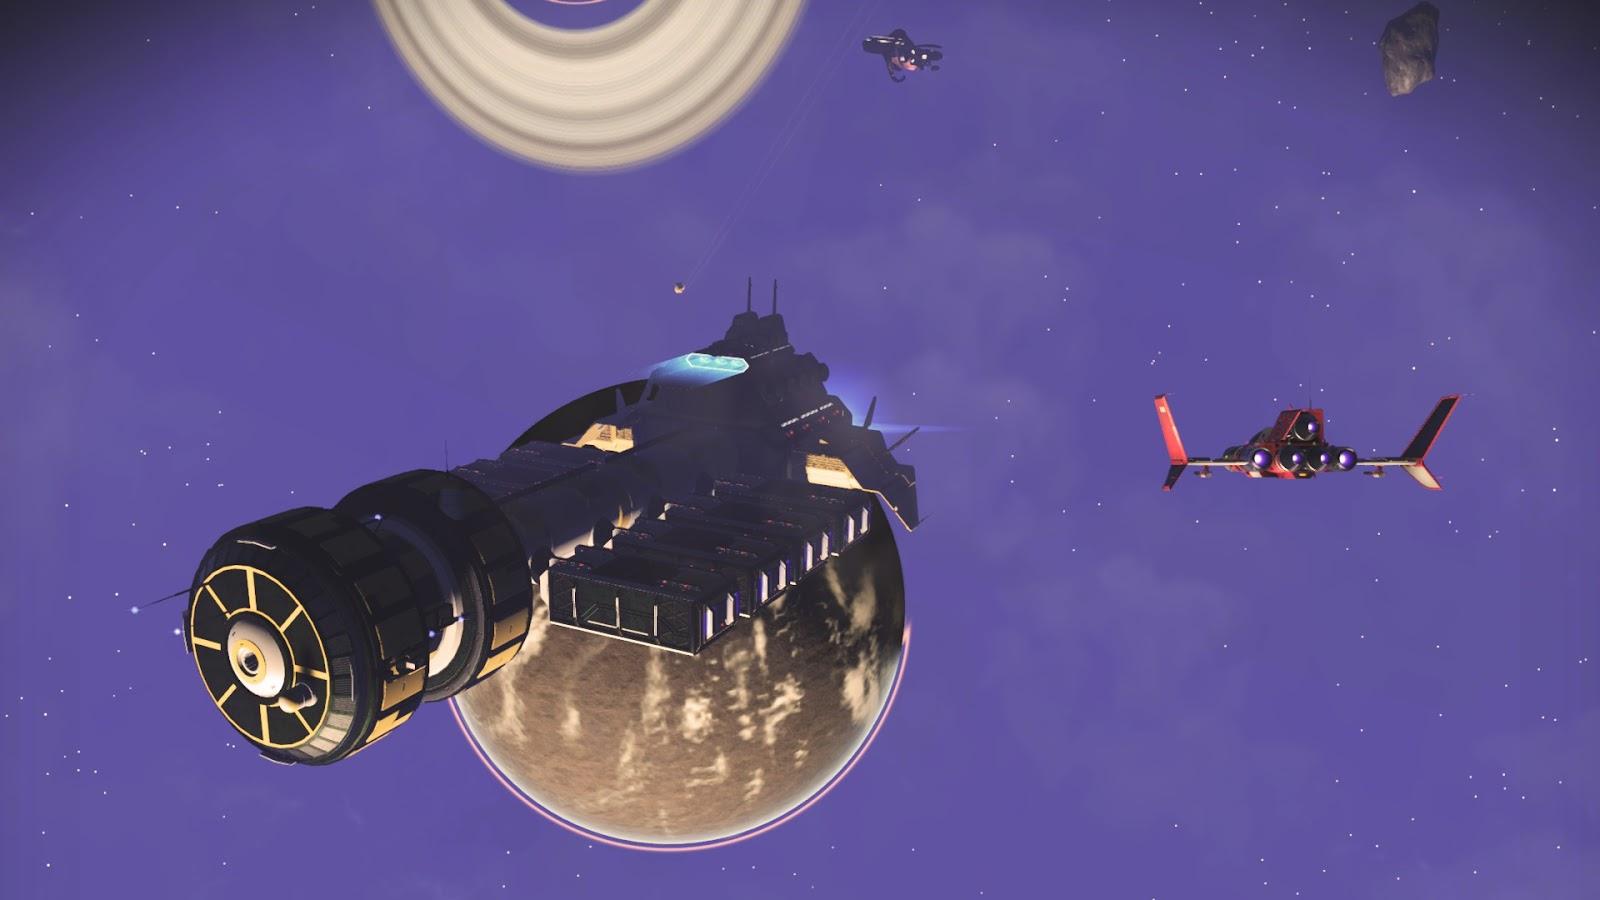 Space Gaming Fun Time